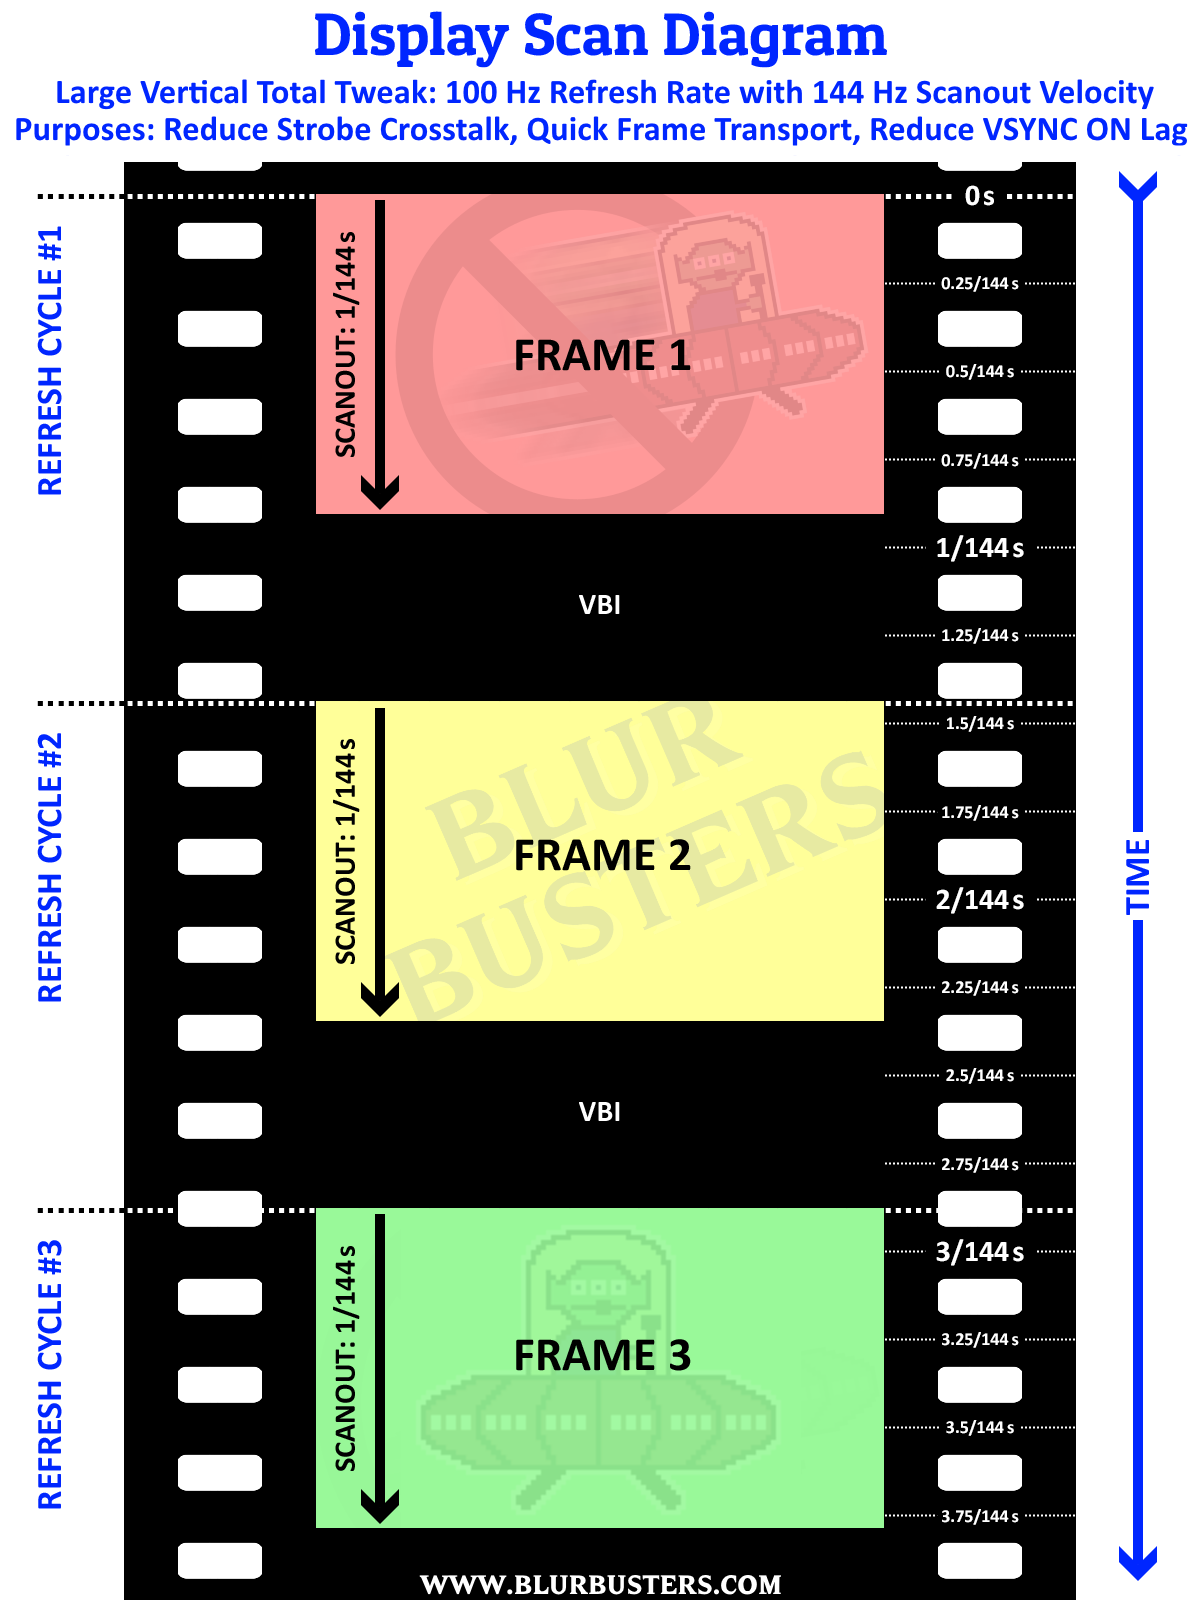 Strobe Crosstalk: Blur Reduction Double-Images | Blur Busters